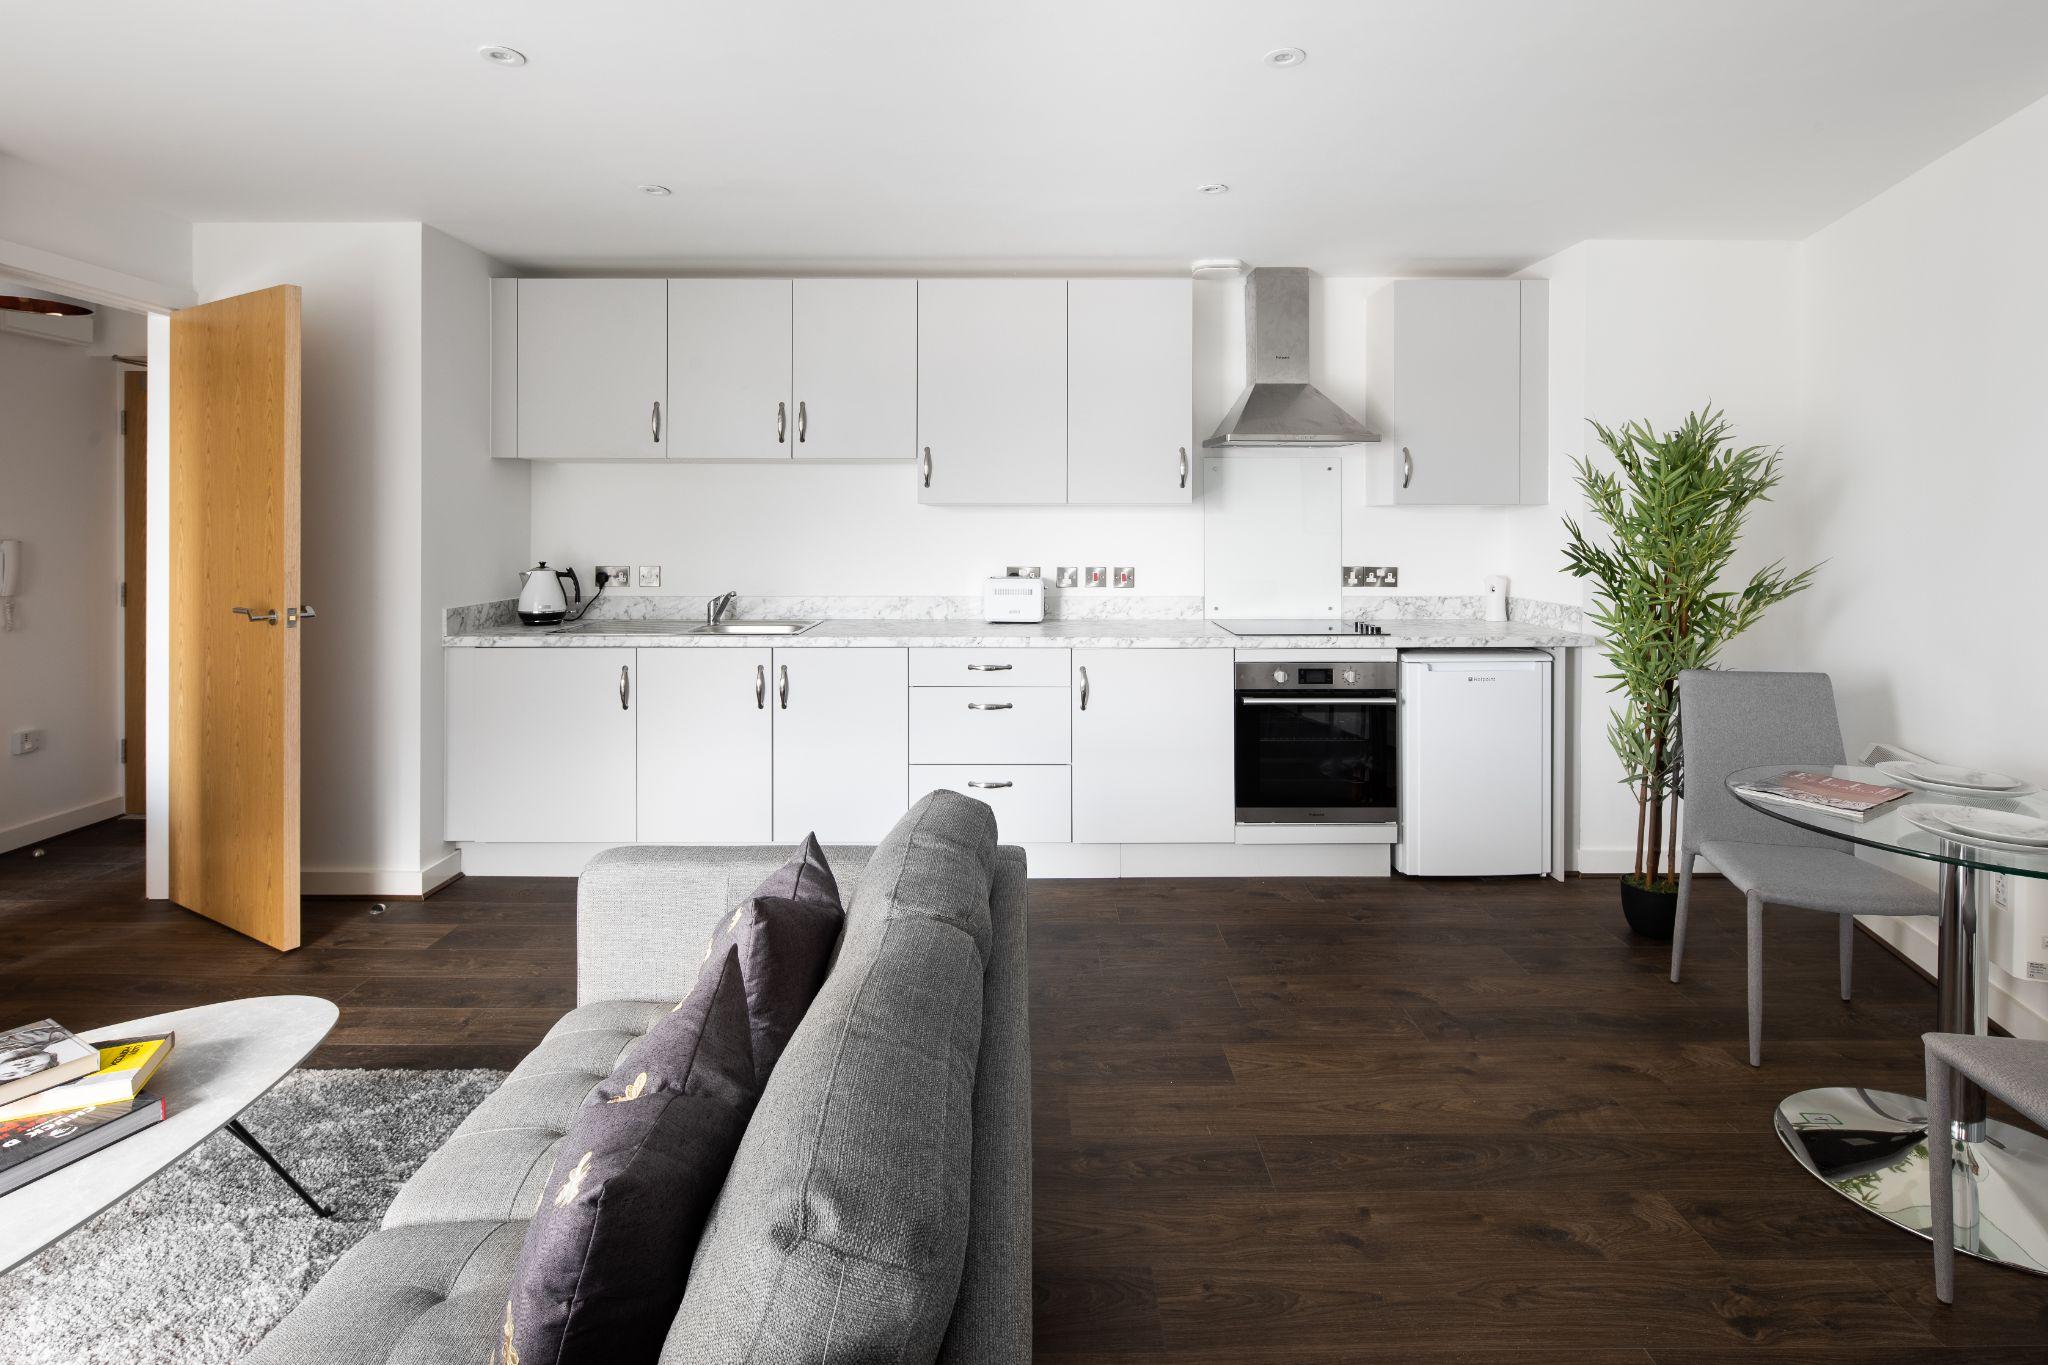 1 Bedroom Apartment Flat/apartment - Photograph 2